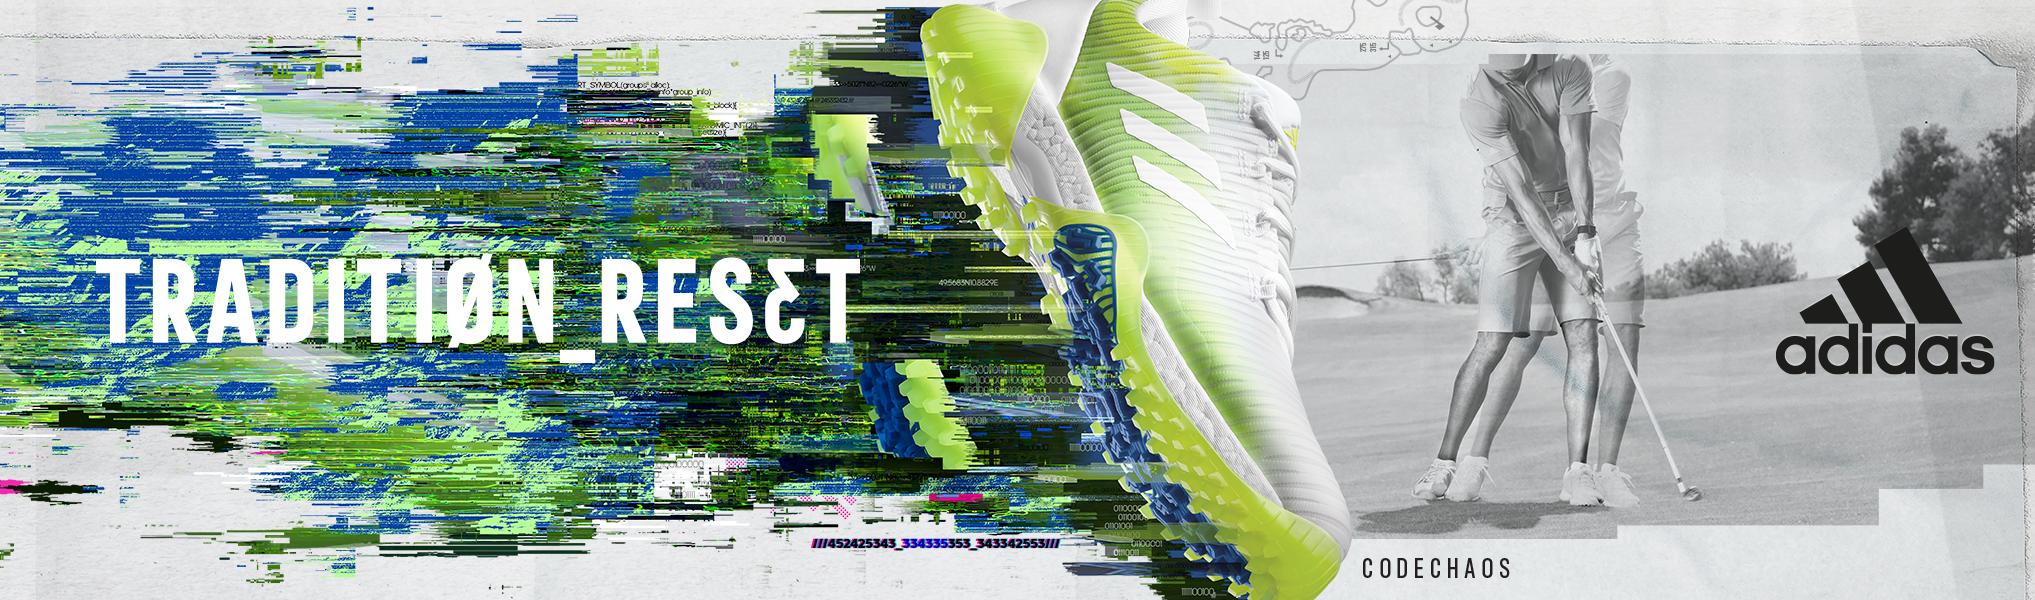 adidas CODECHAOS shoe image